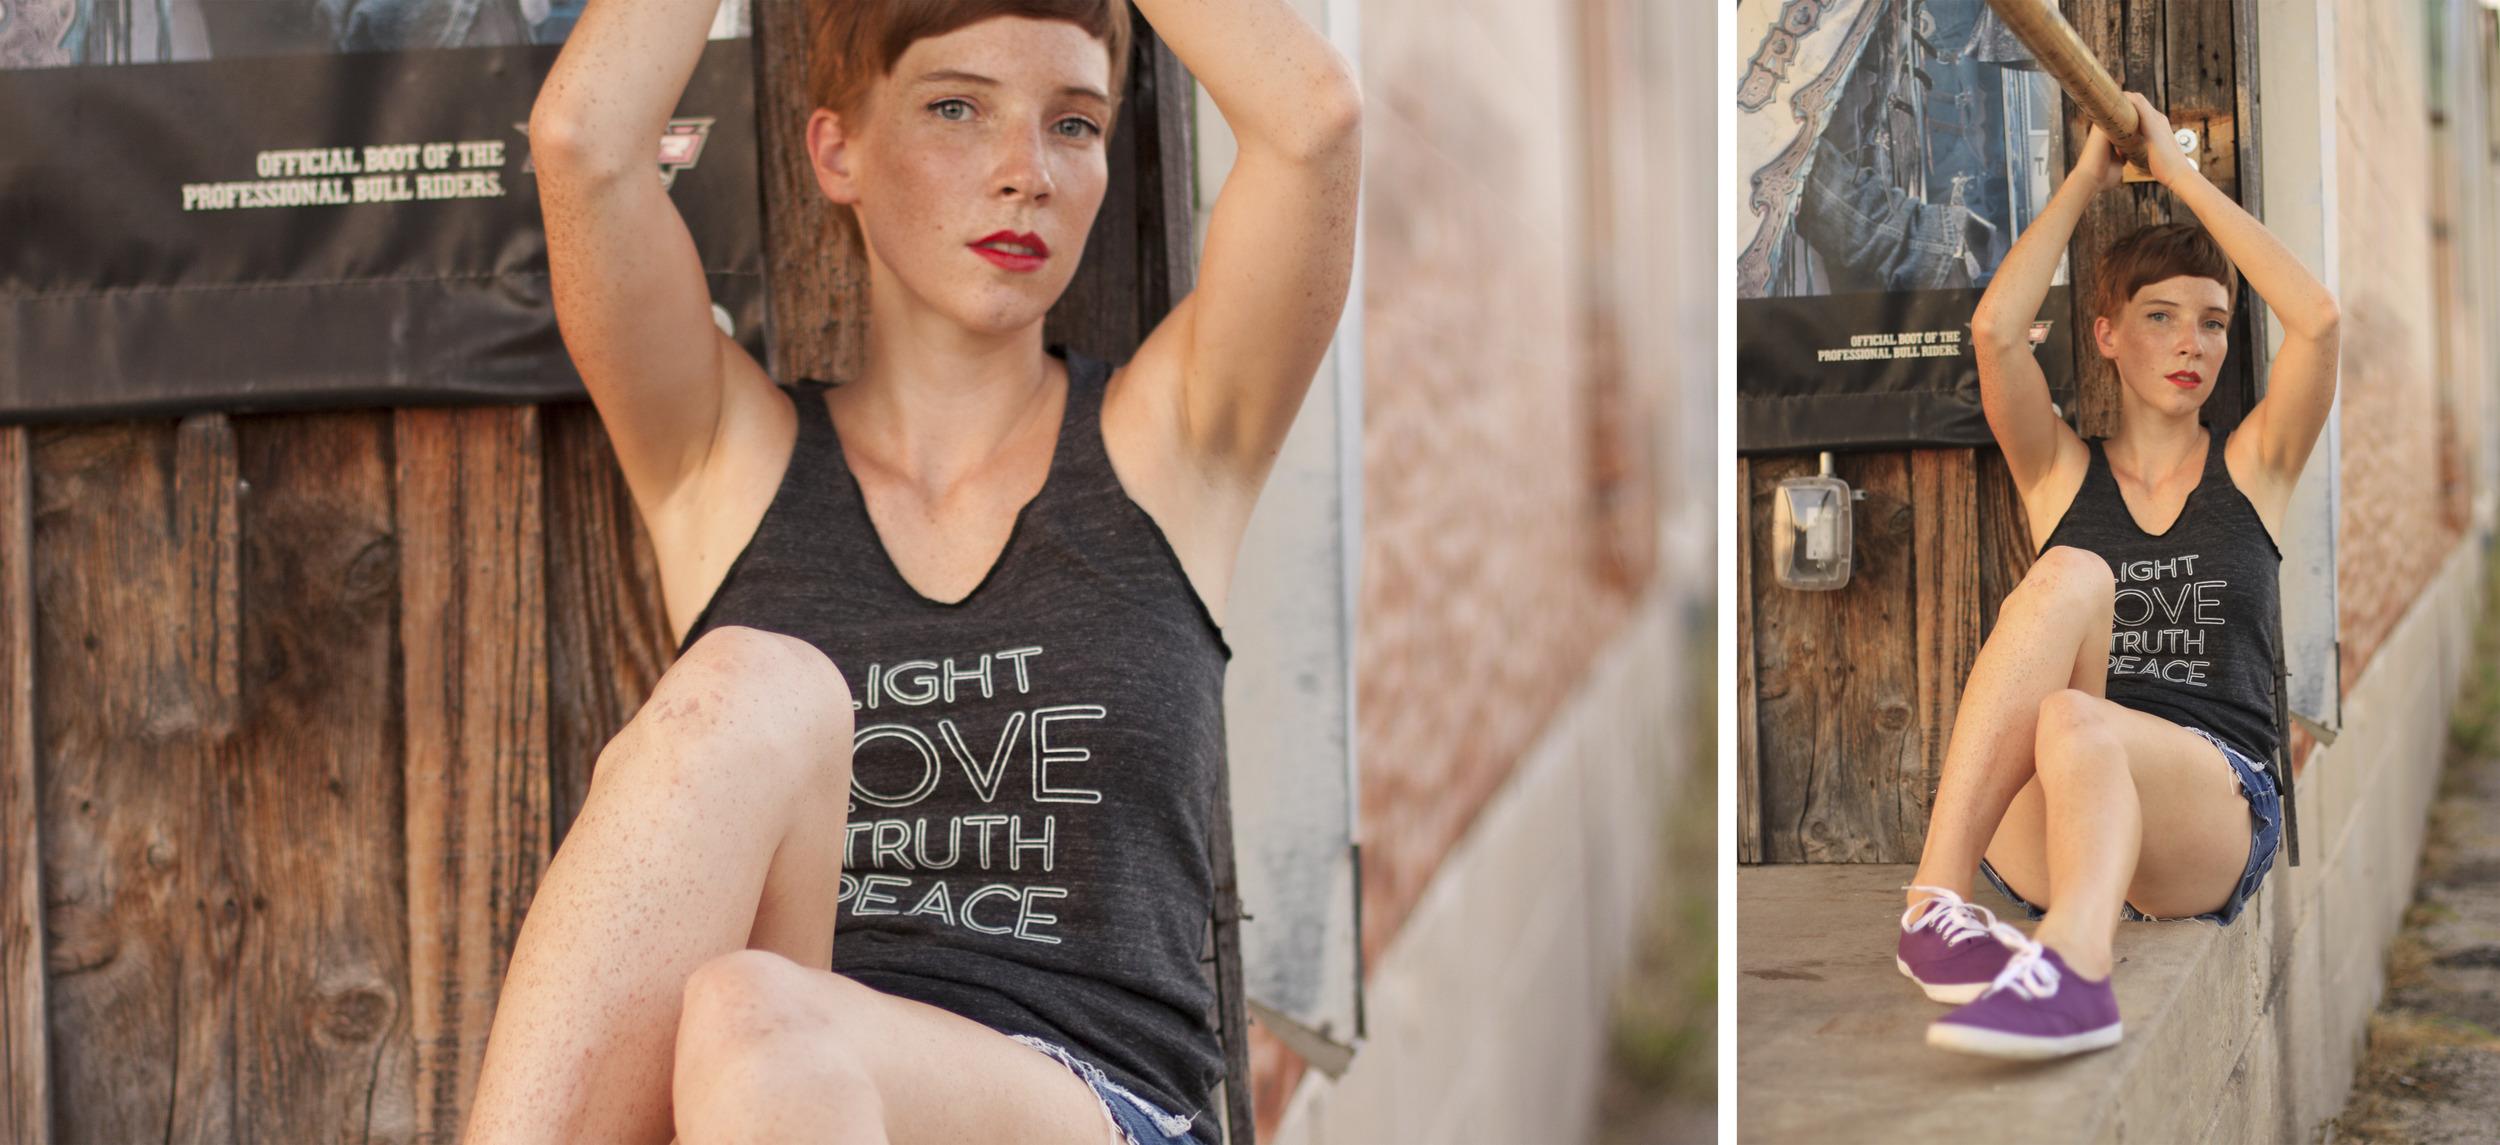 Light Love Truth Peace Tee